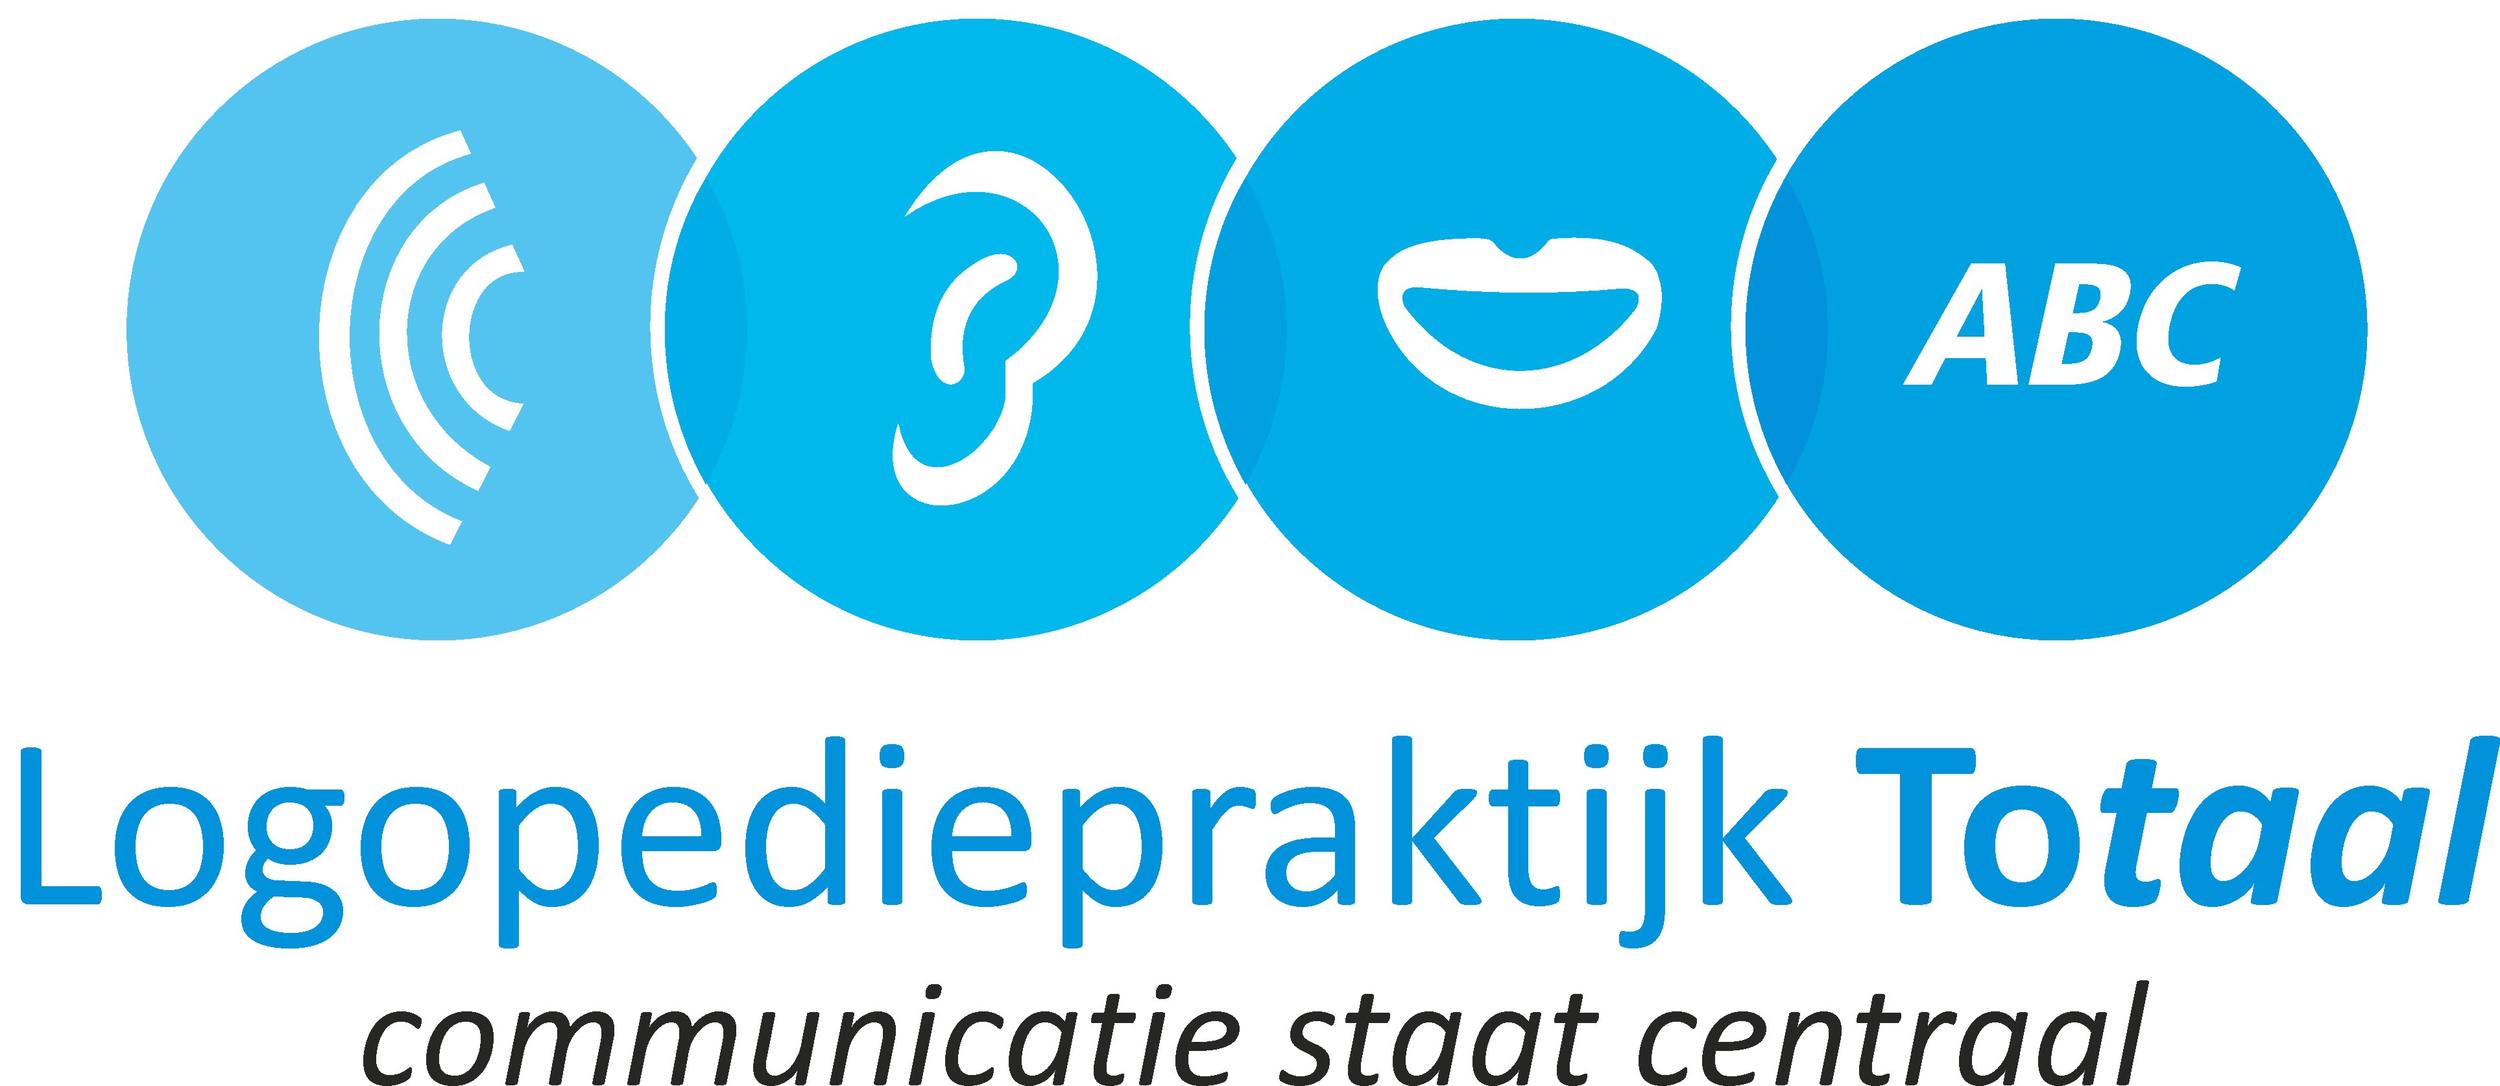 Logopedietotaal.jpg